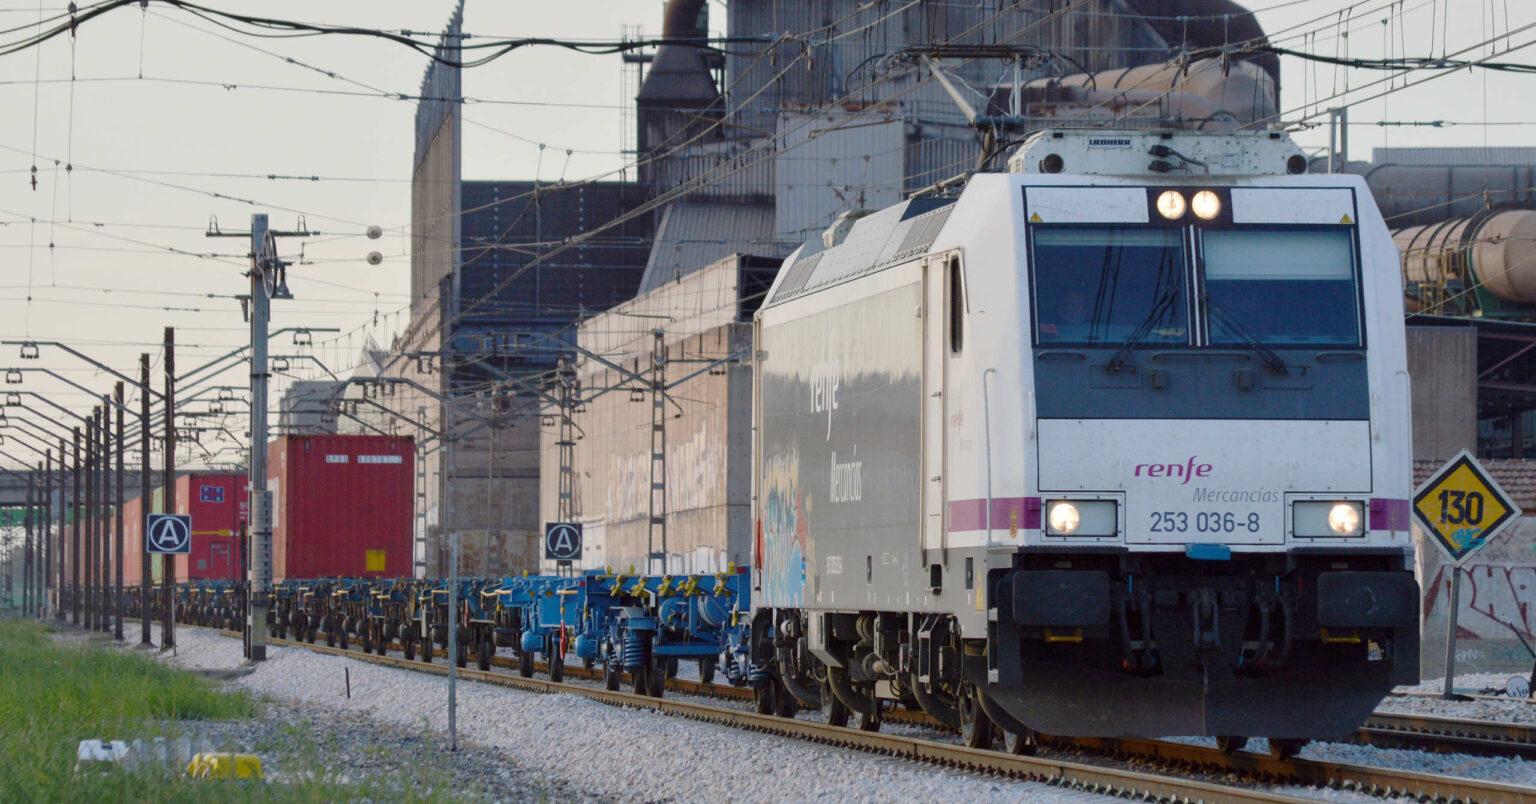 Tren portacontenedores de OPDR operado por Renfe Mercancías pasando por Getafe. FURBYTRENES.